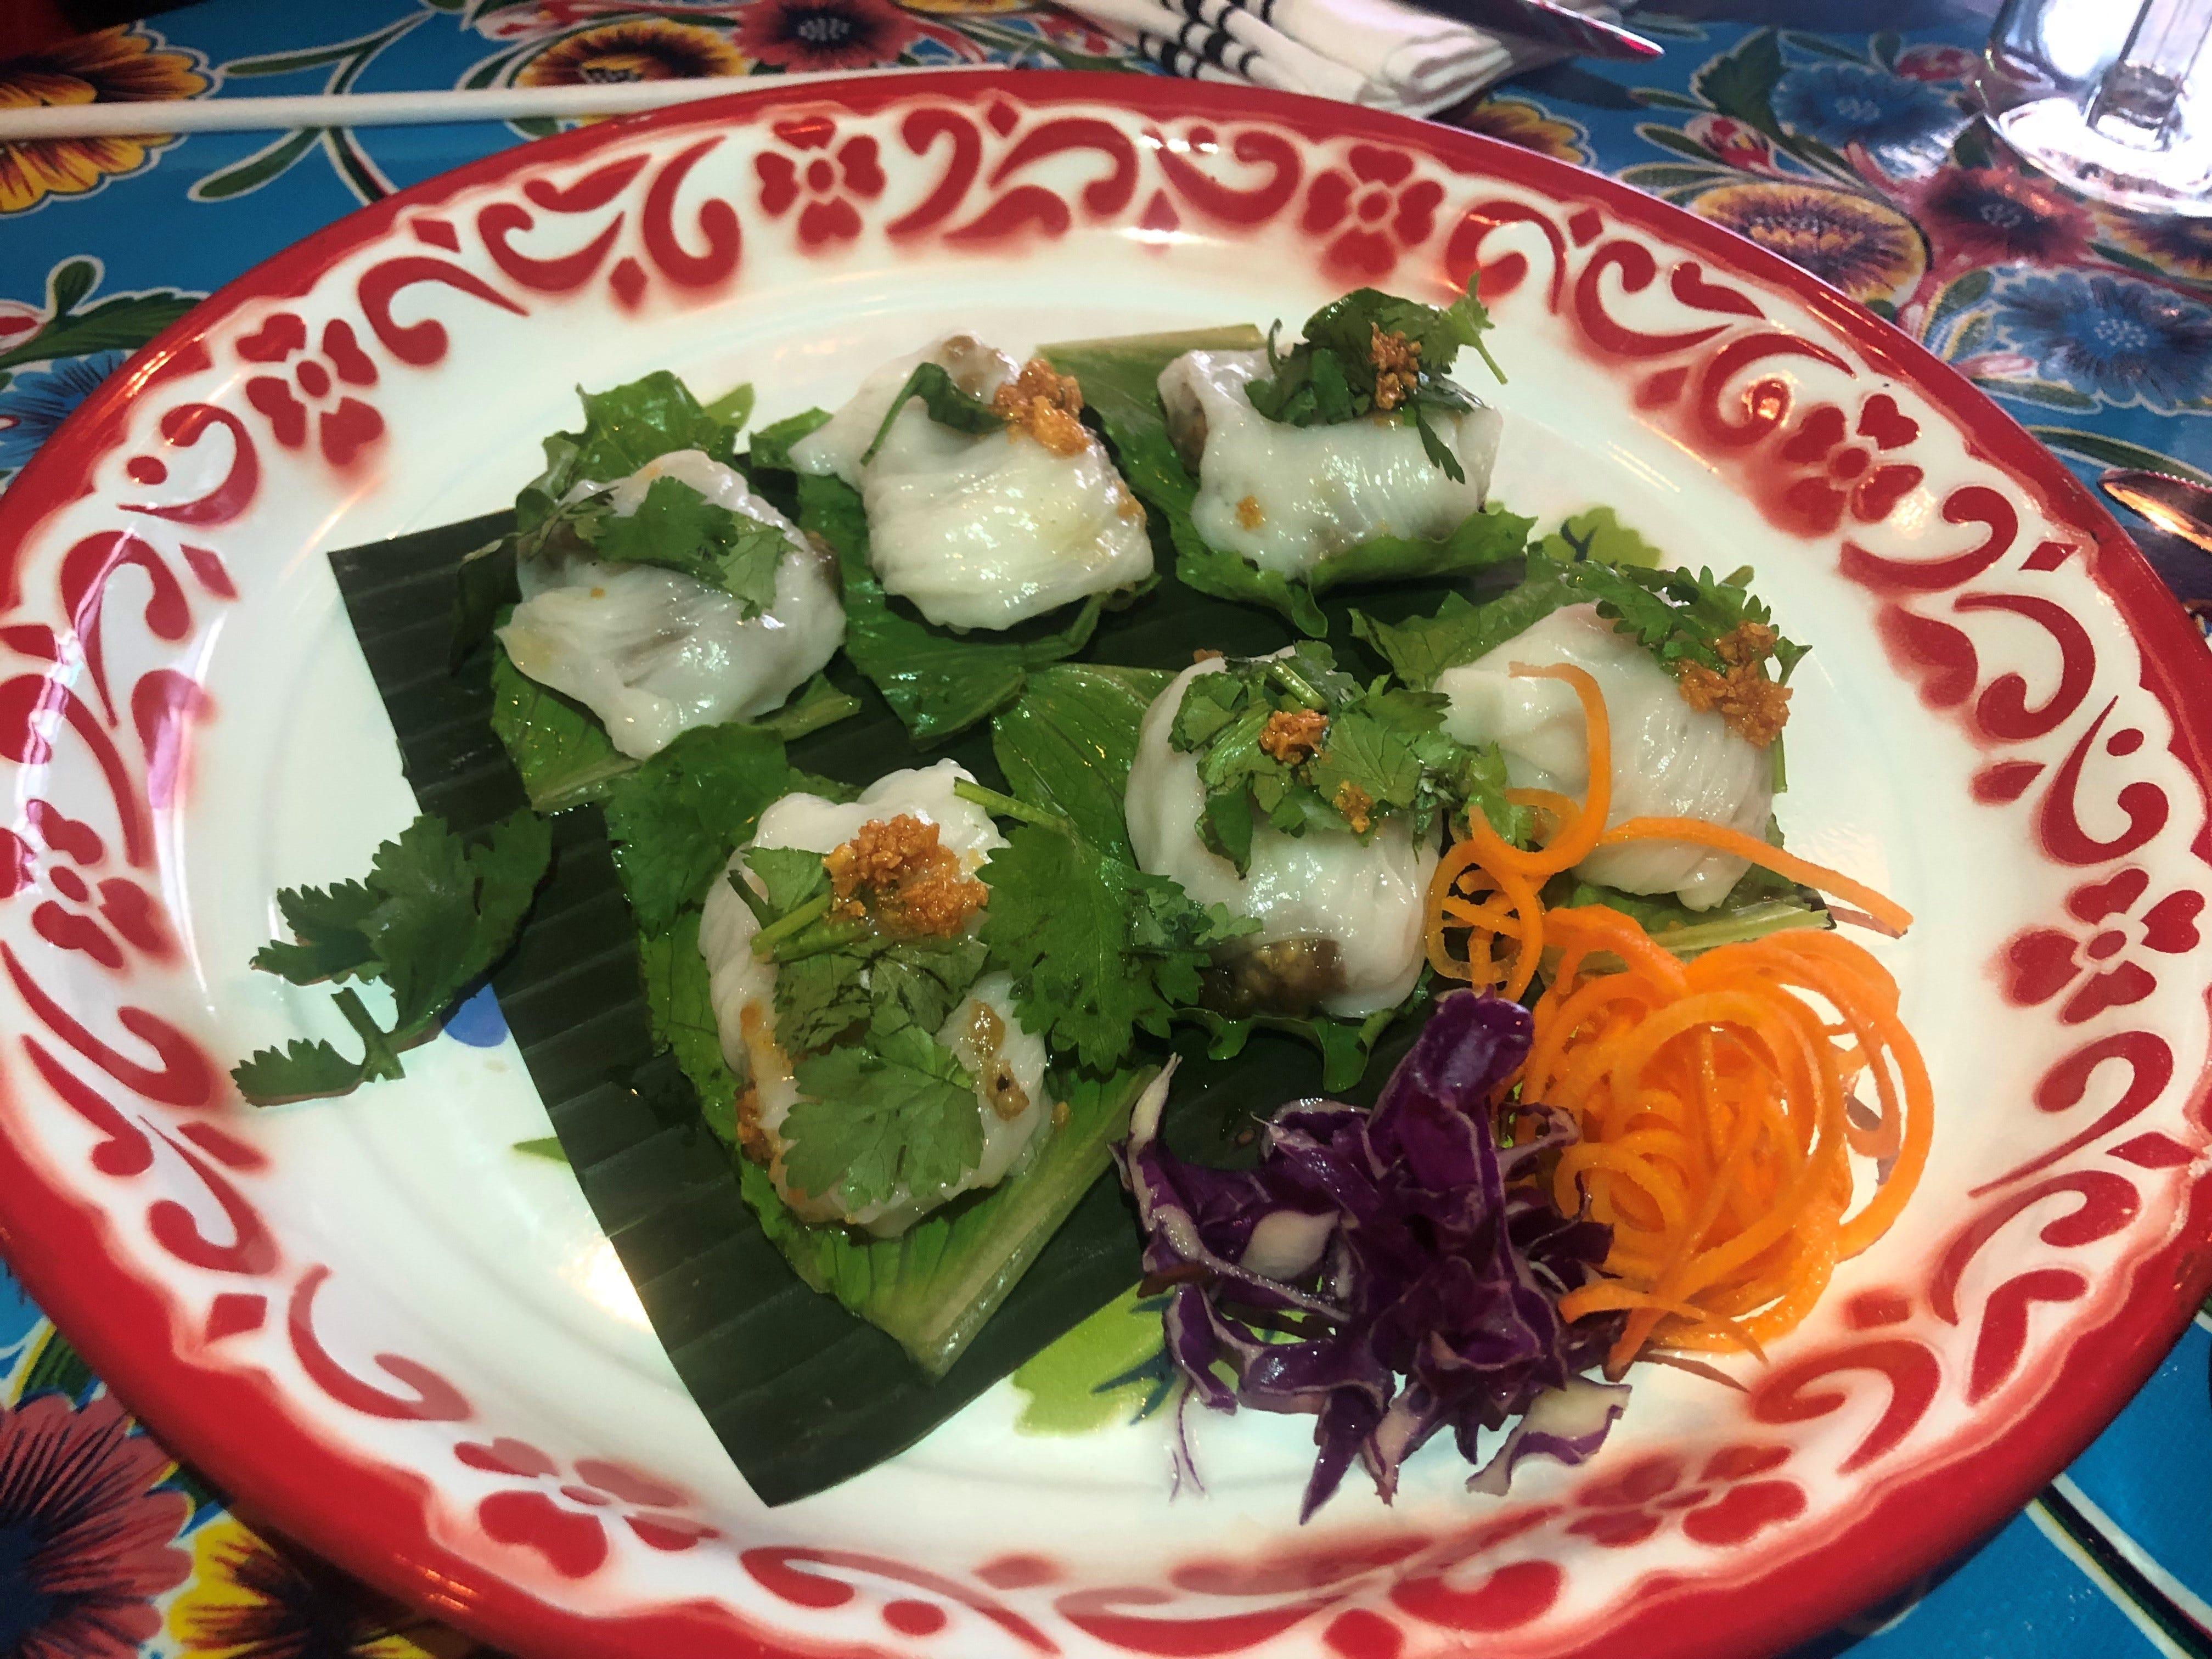 The pak mor at Kai Yang is a type of Thai dumpling.